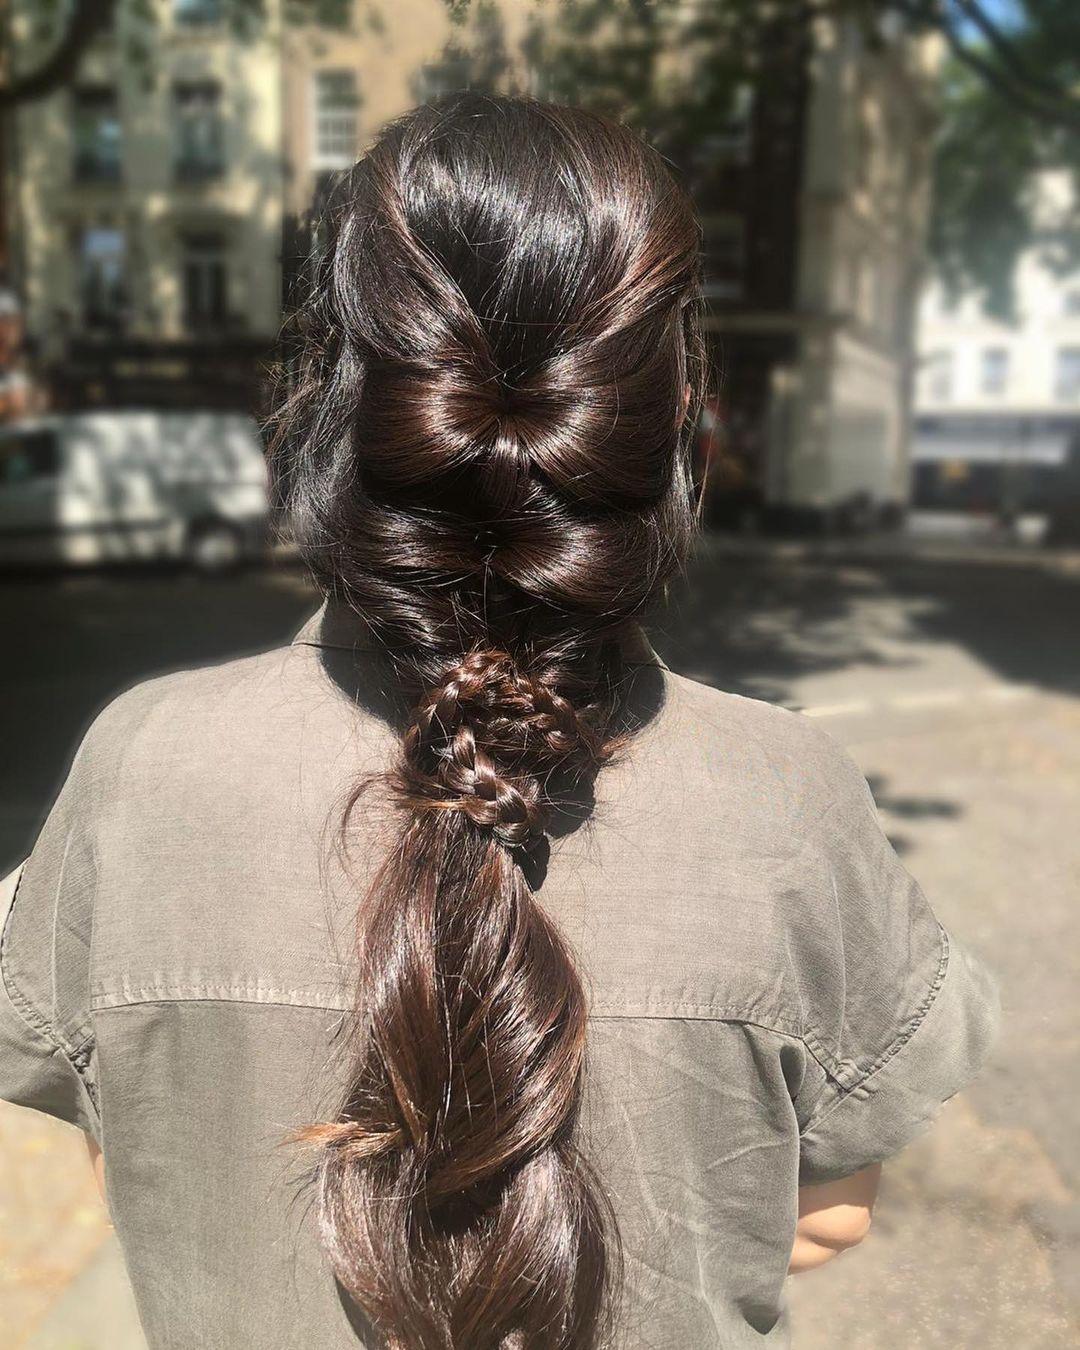 INOAR Brazilian Blow Dry treatment at Gusto Hair Salons in London